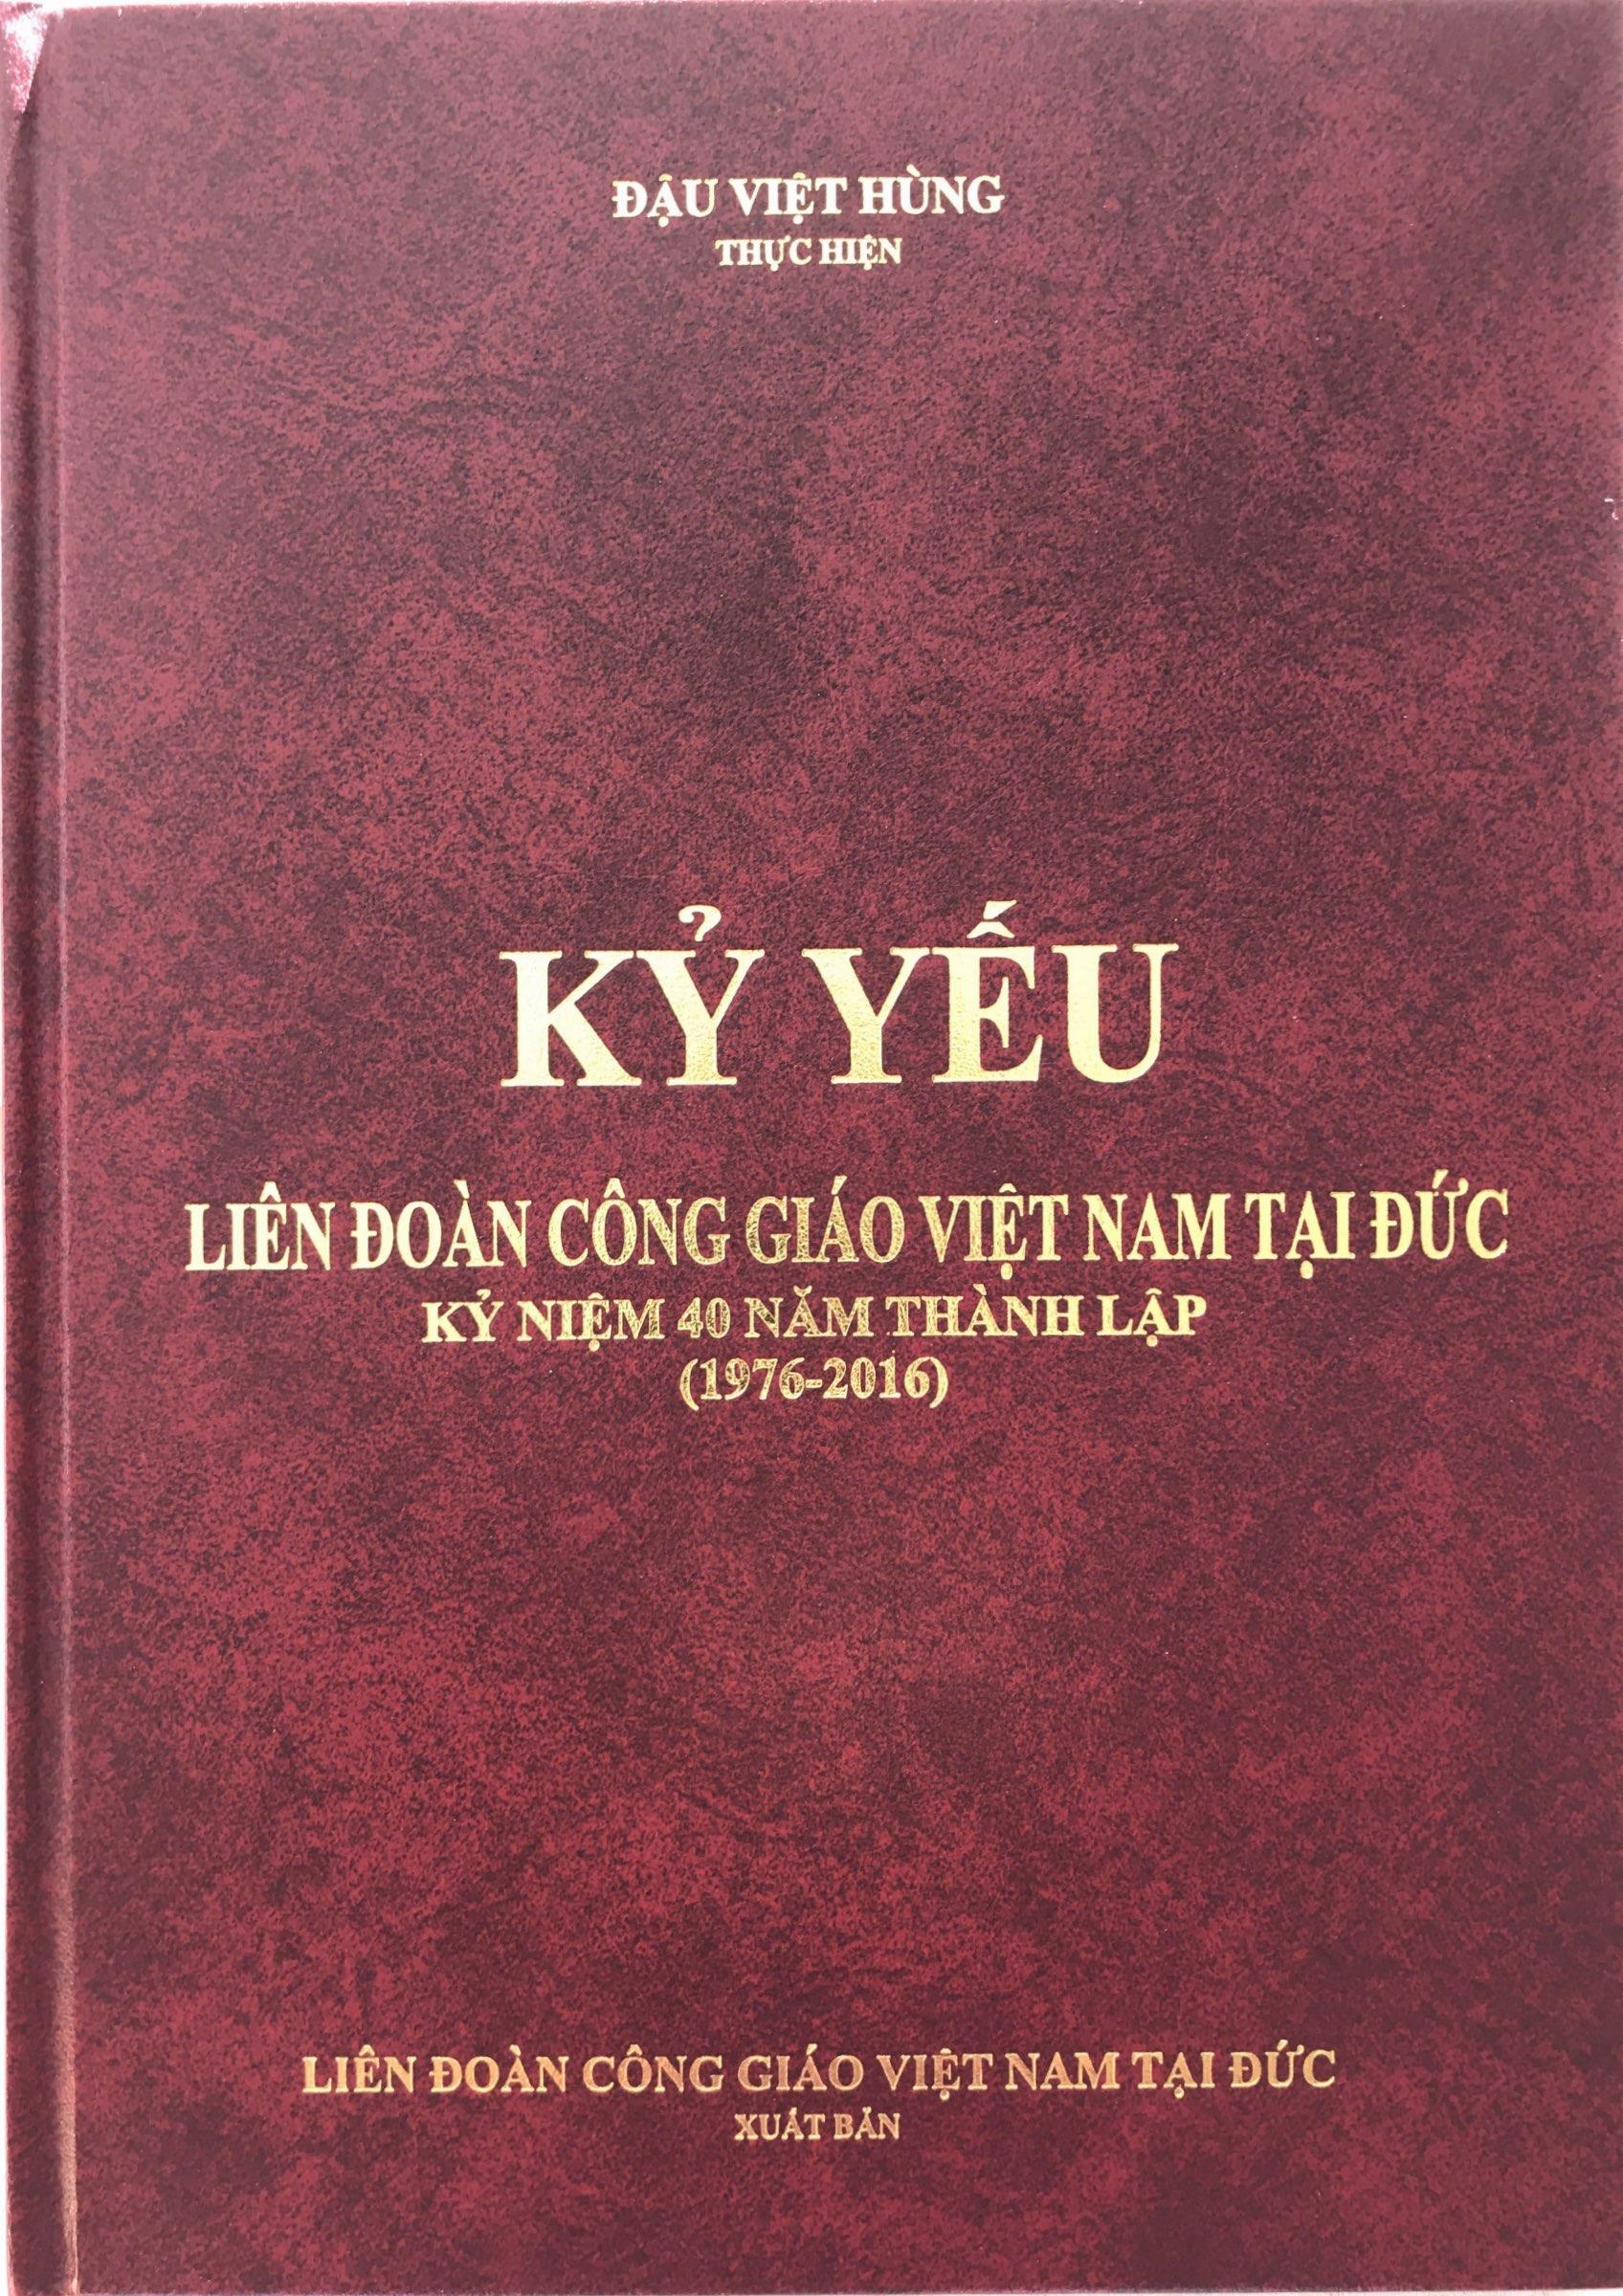 Ky yeu LDCG